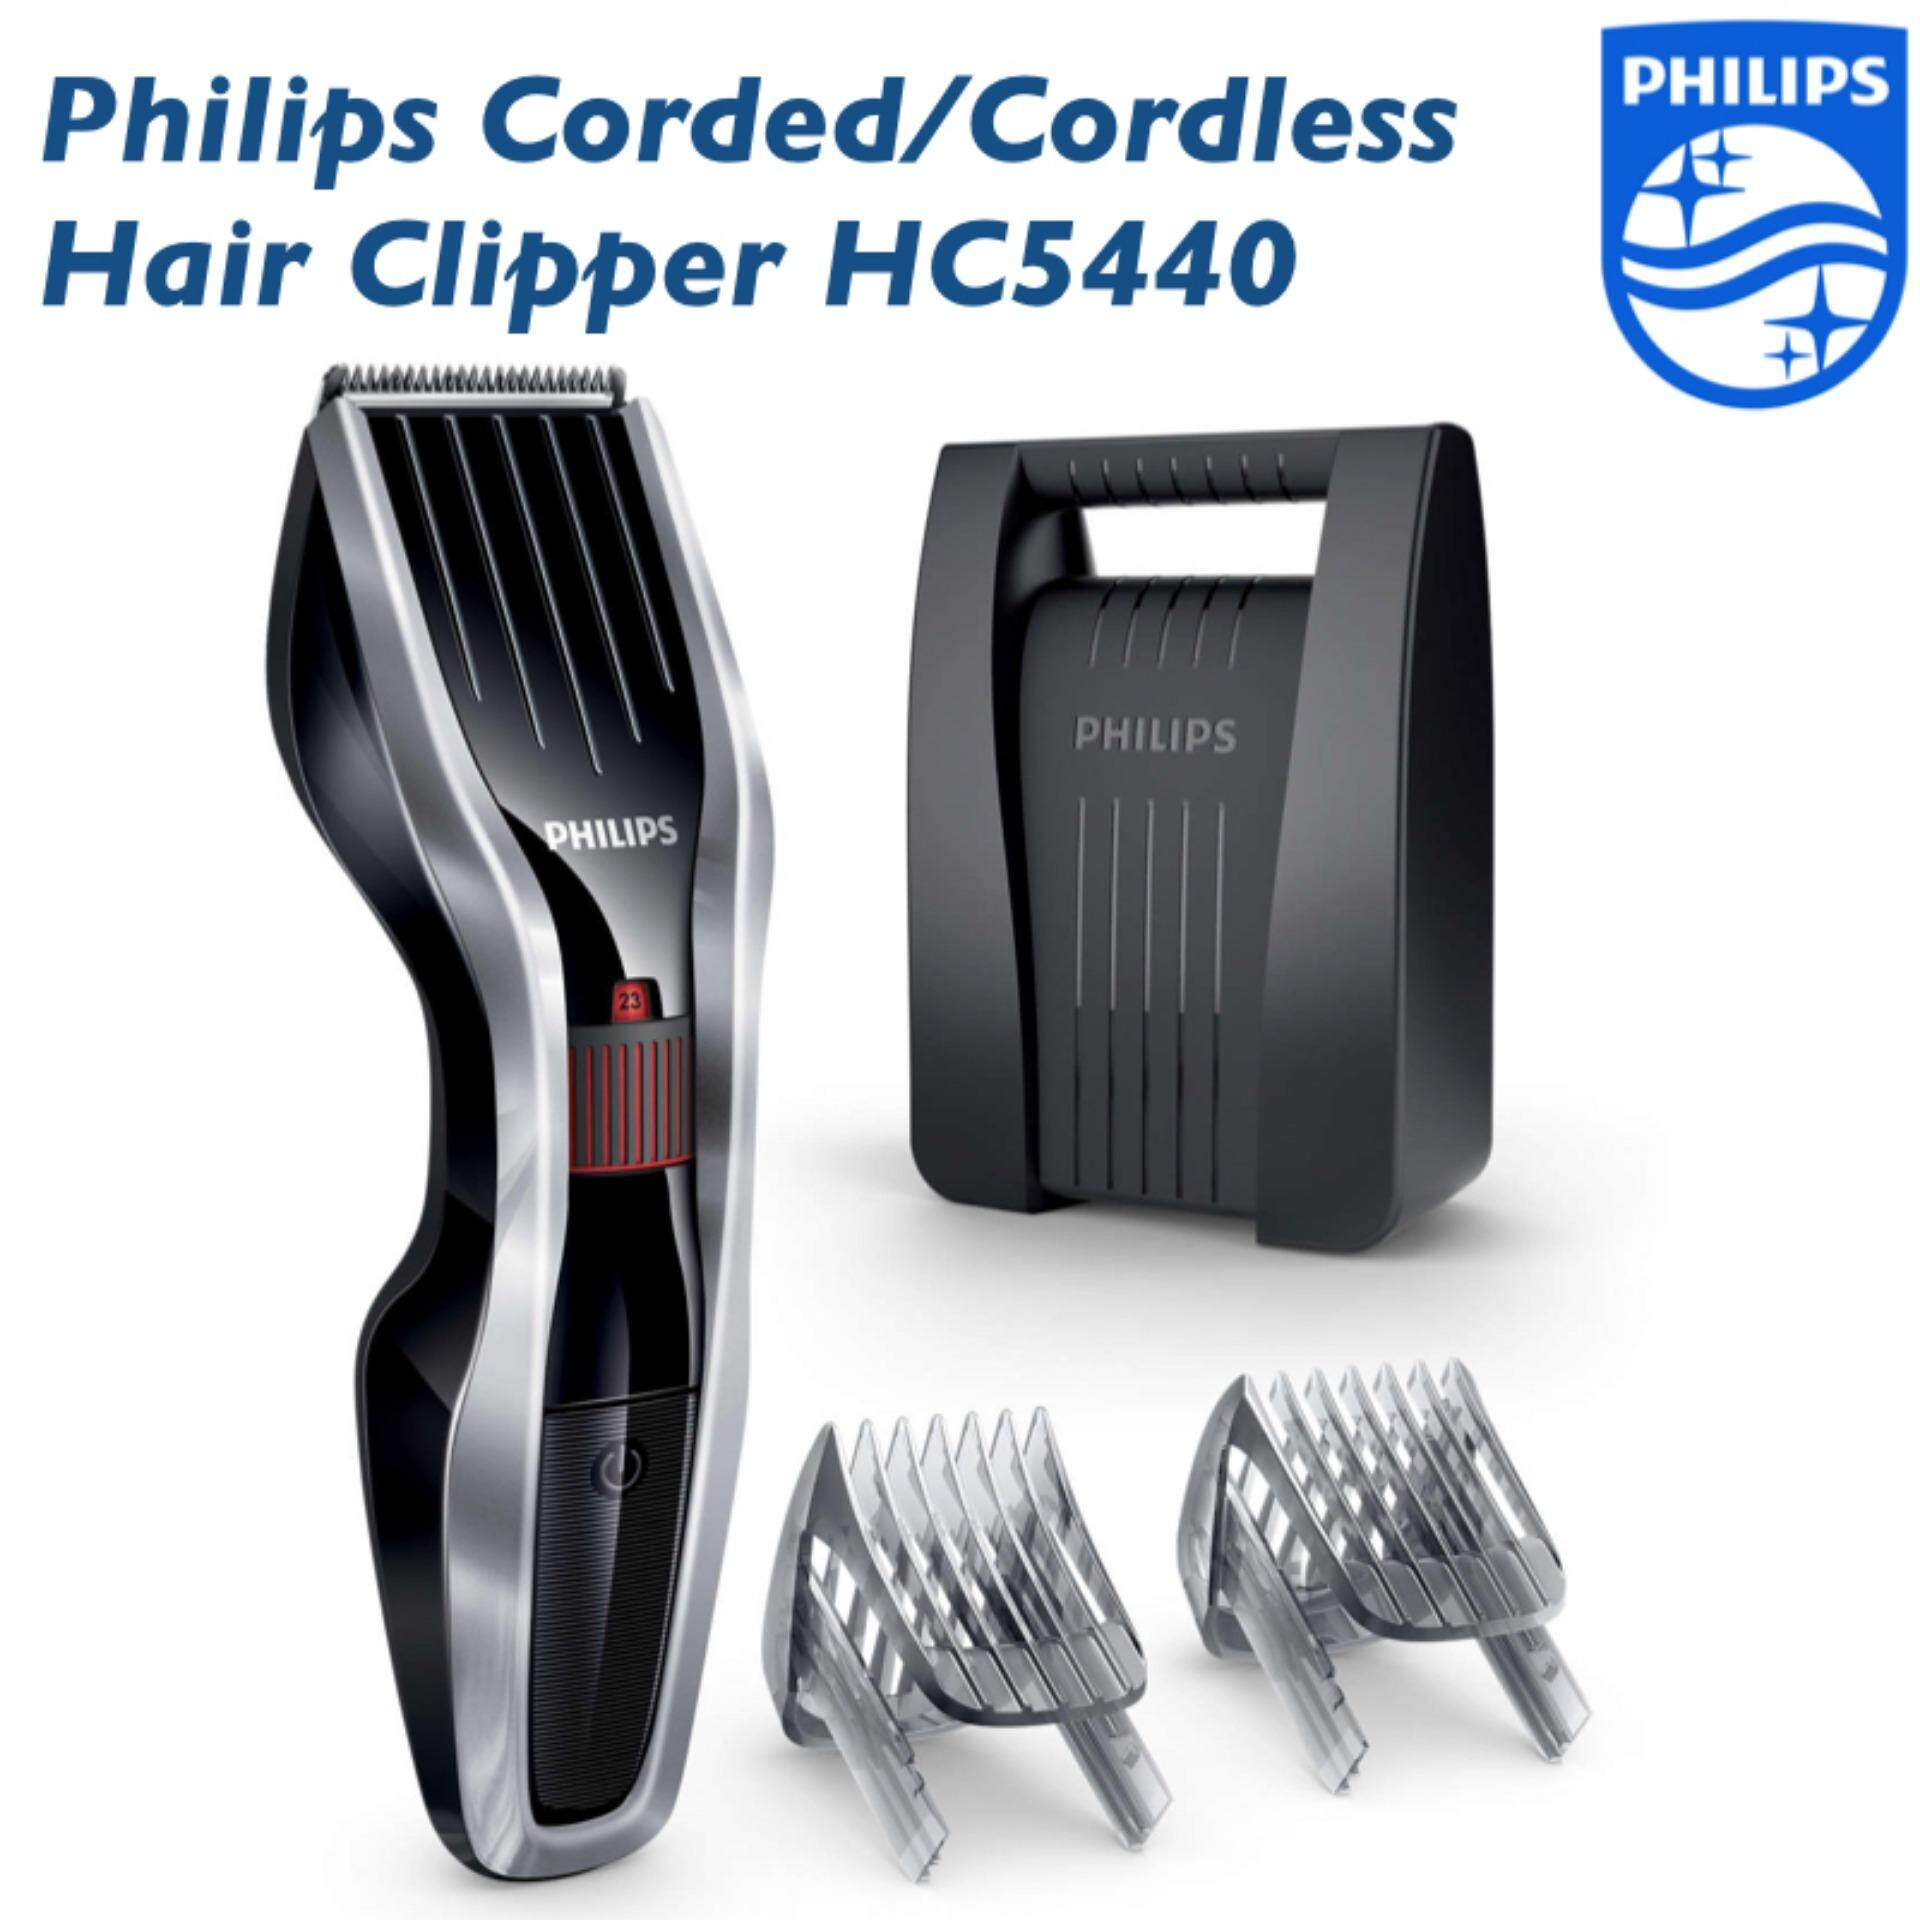 Philips Cordless Hair Clipper HC5440